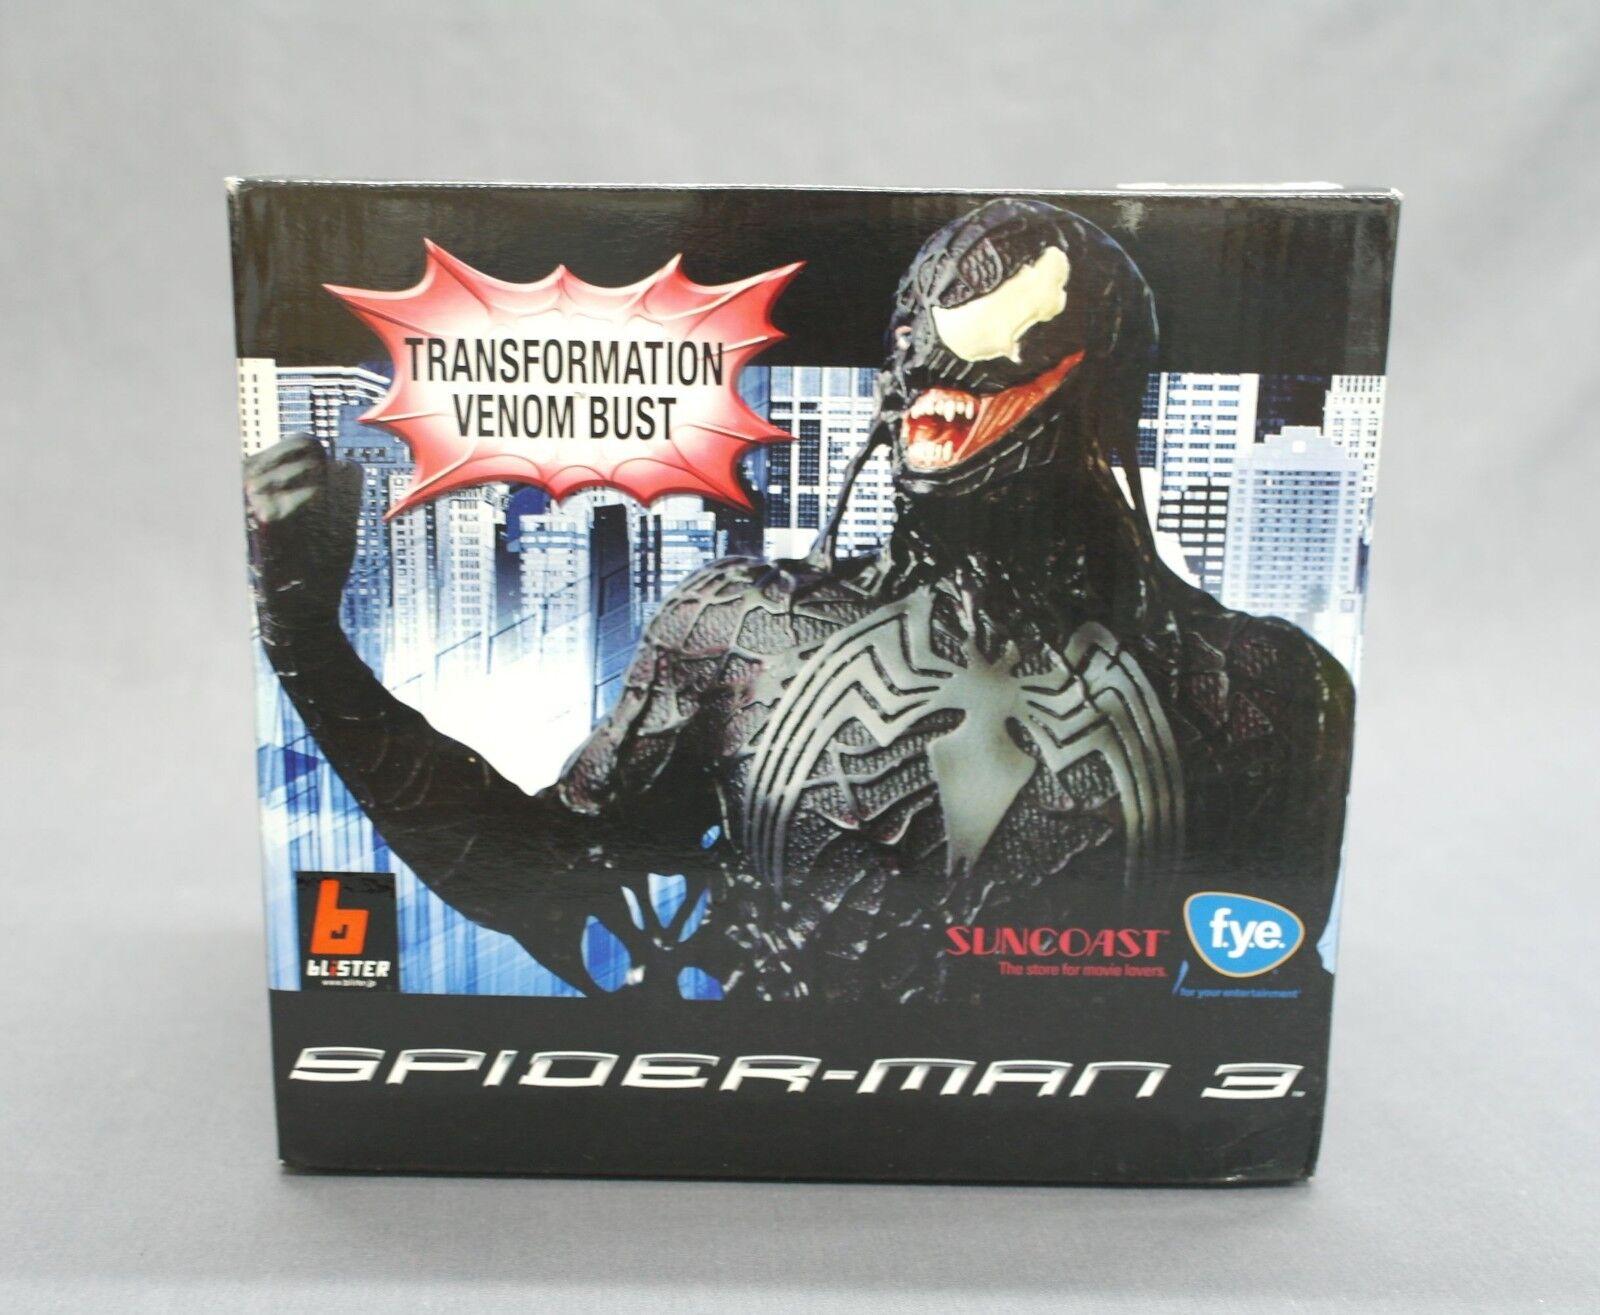 Spider-Man 3 FYE/Suncoast Transformation Venom Bust Diamond Select NEW B80